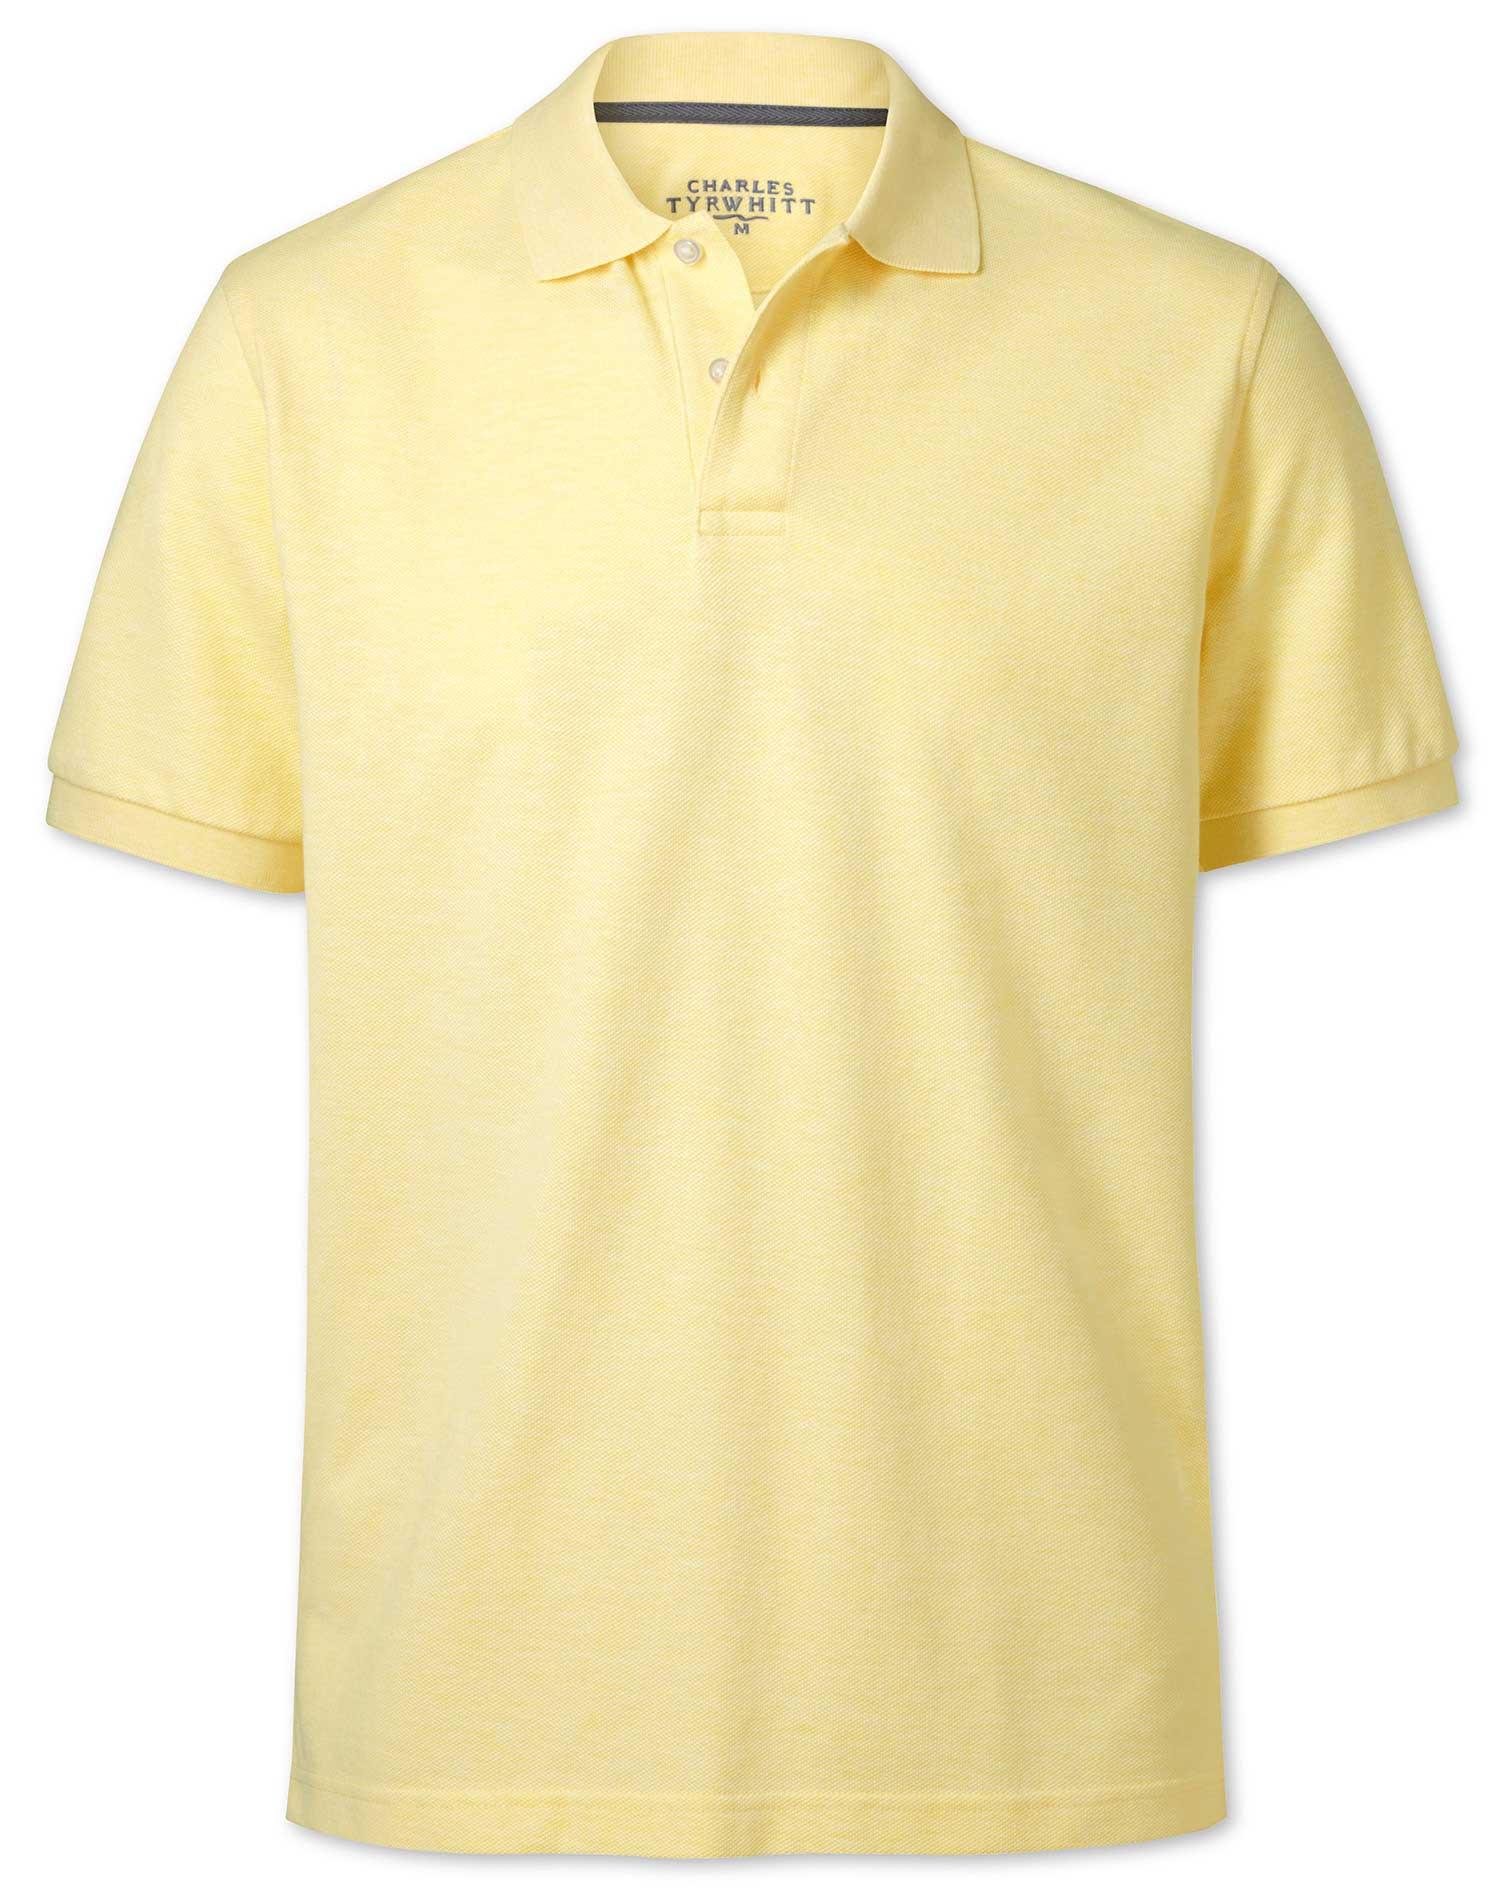 Light Yellow Melange Pique Cotton Polo Size Medium by Charles Tyrwhitt